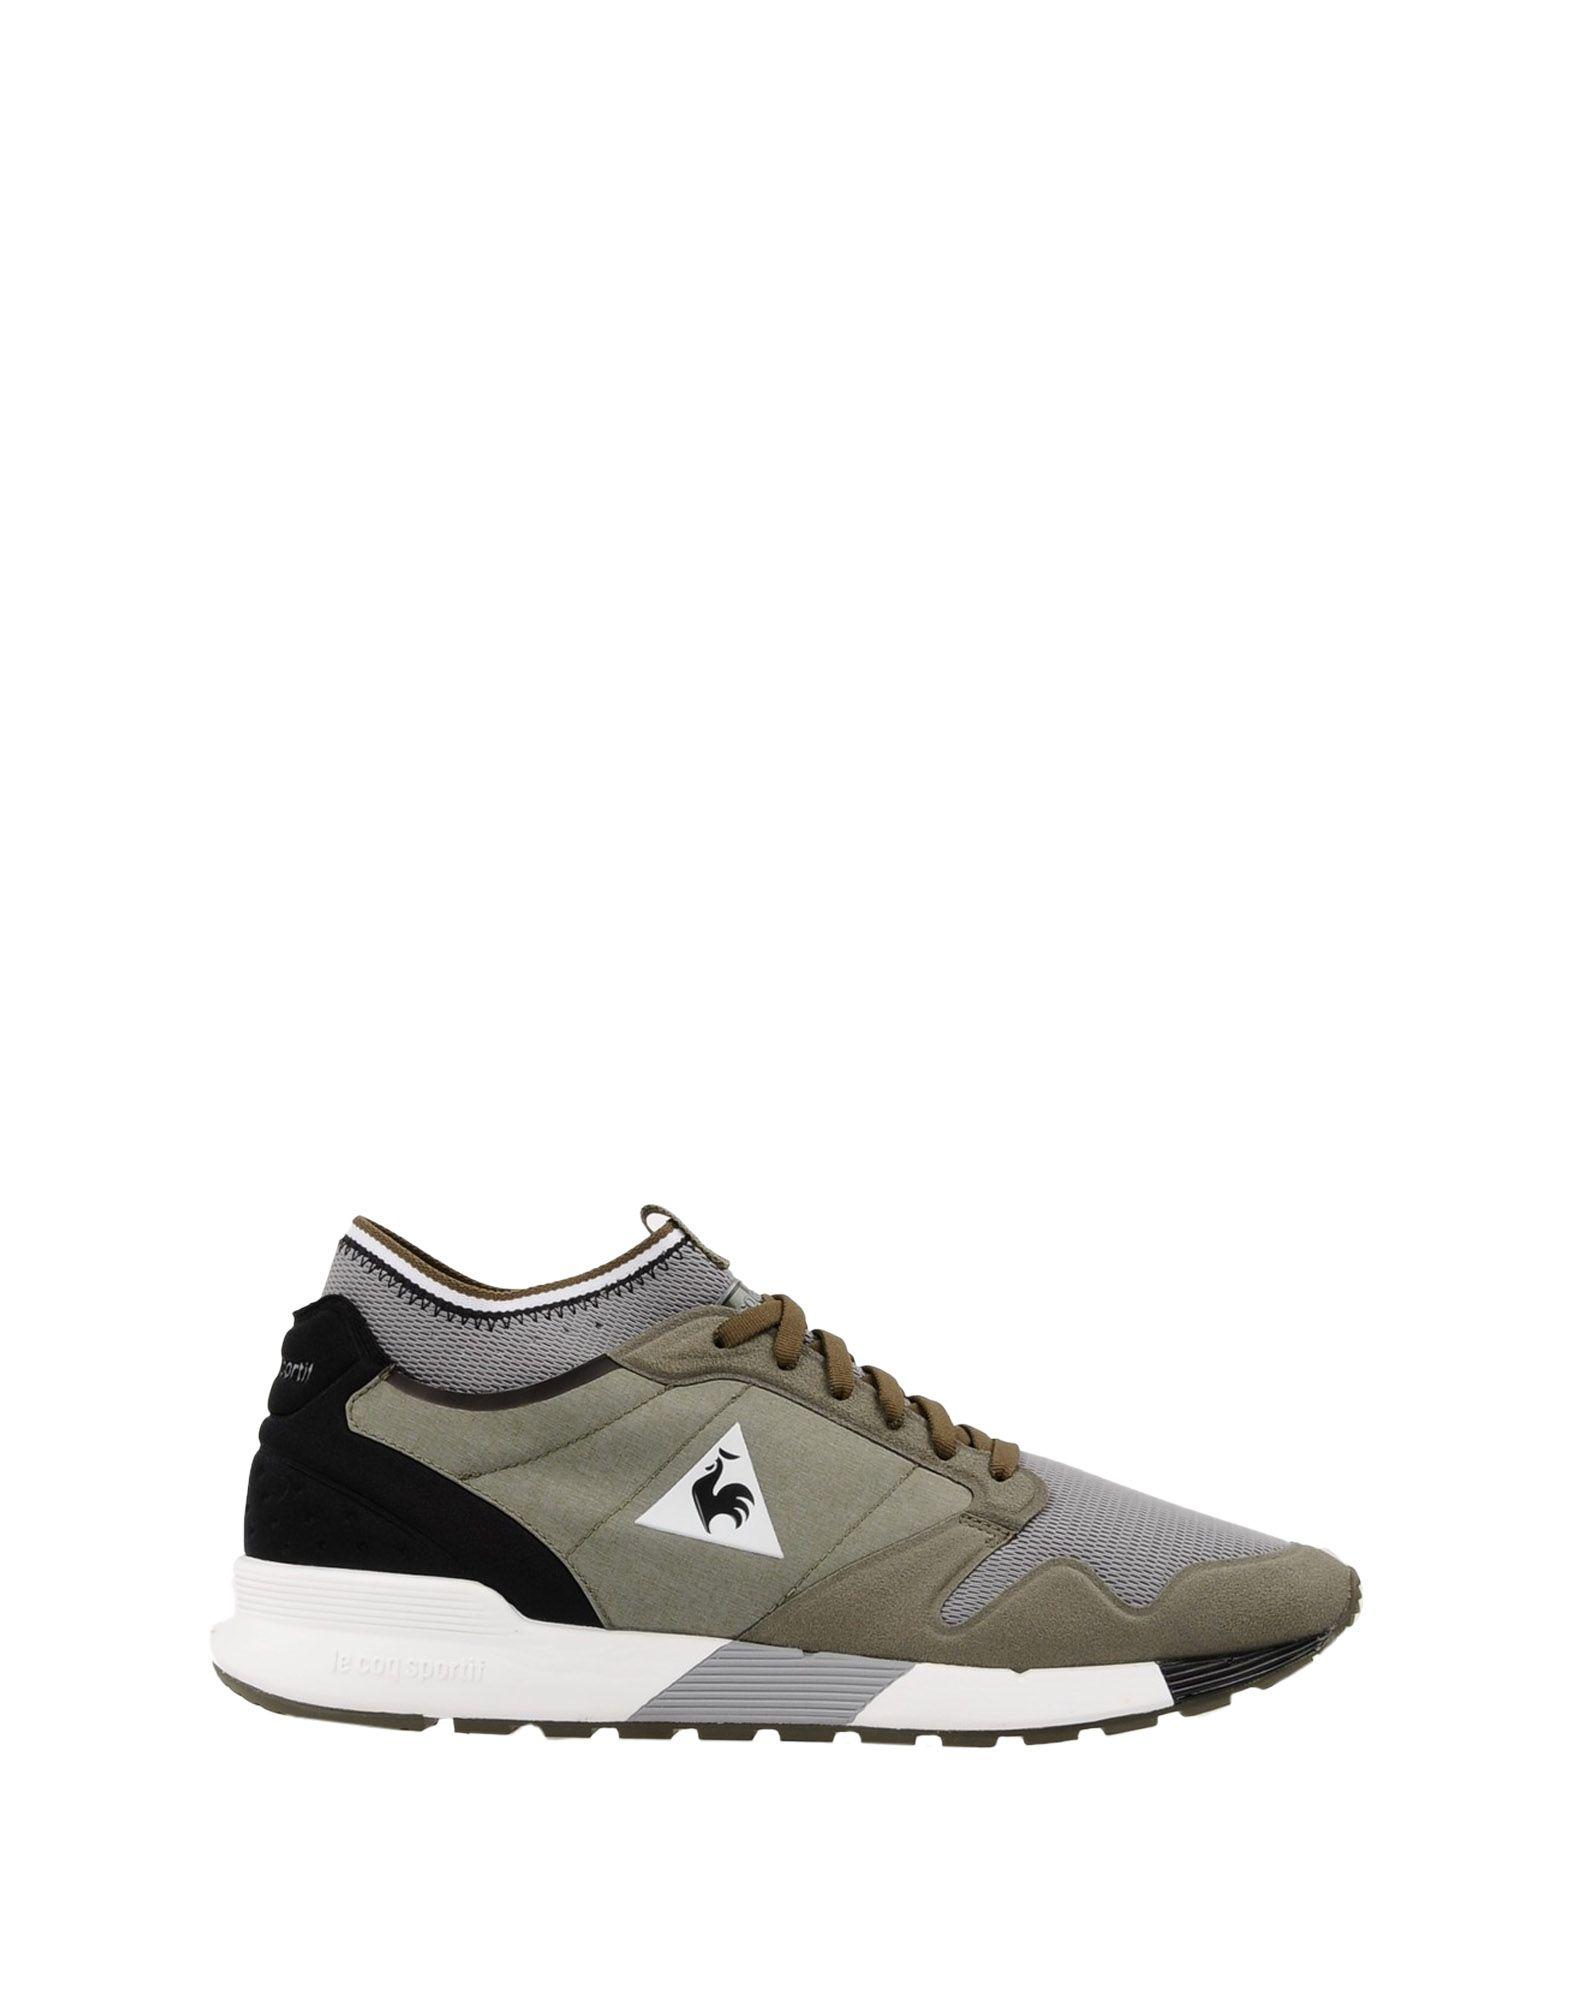 Sneakers Le Coq Sportif Omicron Techlite - Homme - Sneakers Le Coq Sportif sur